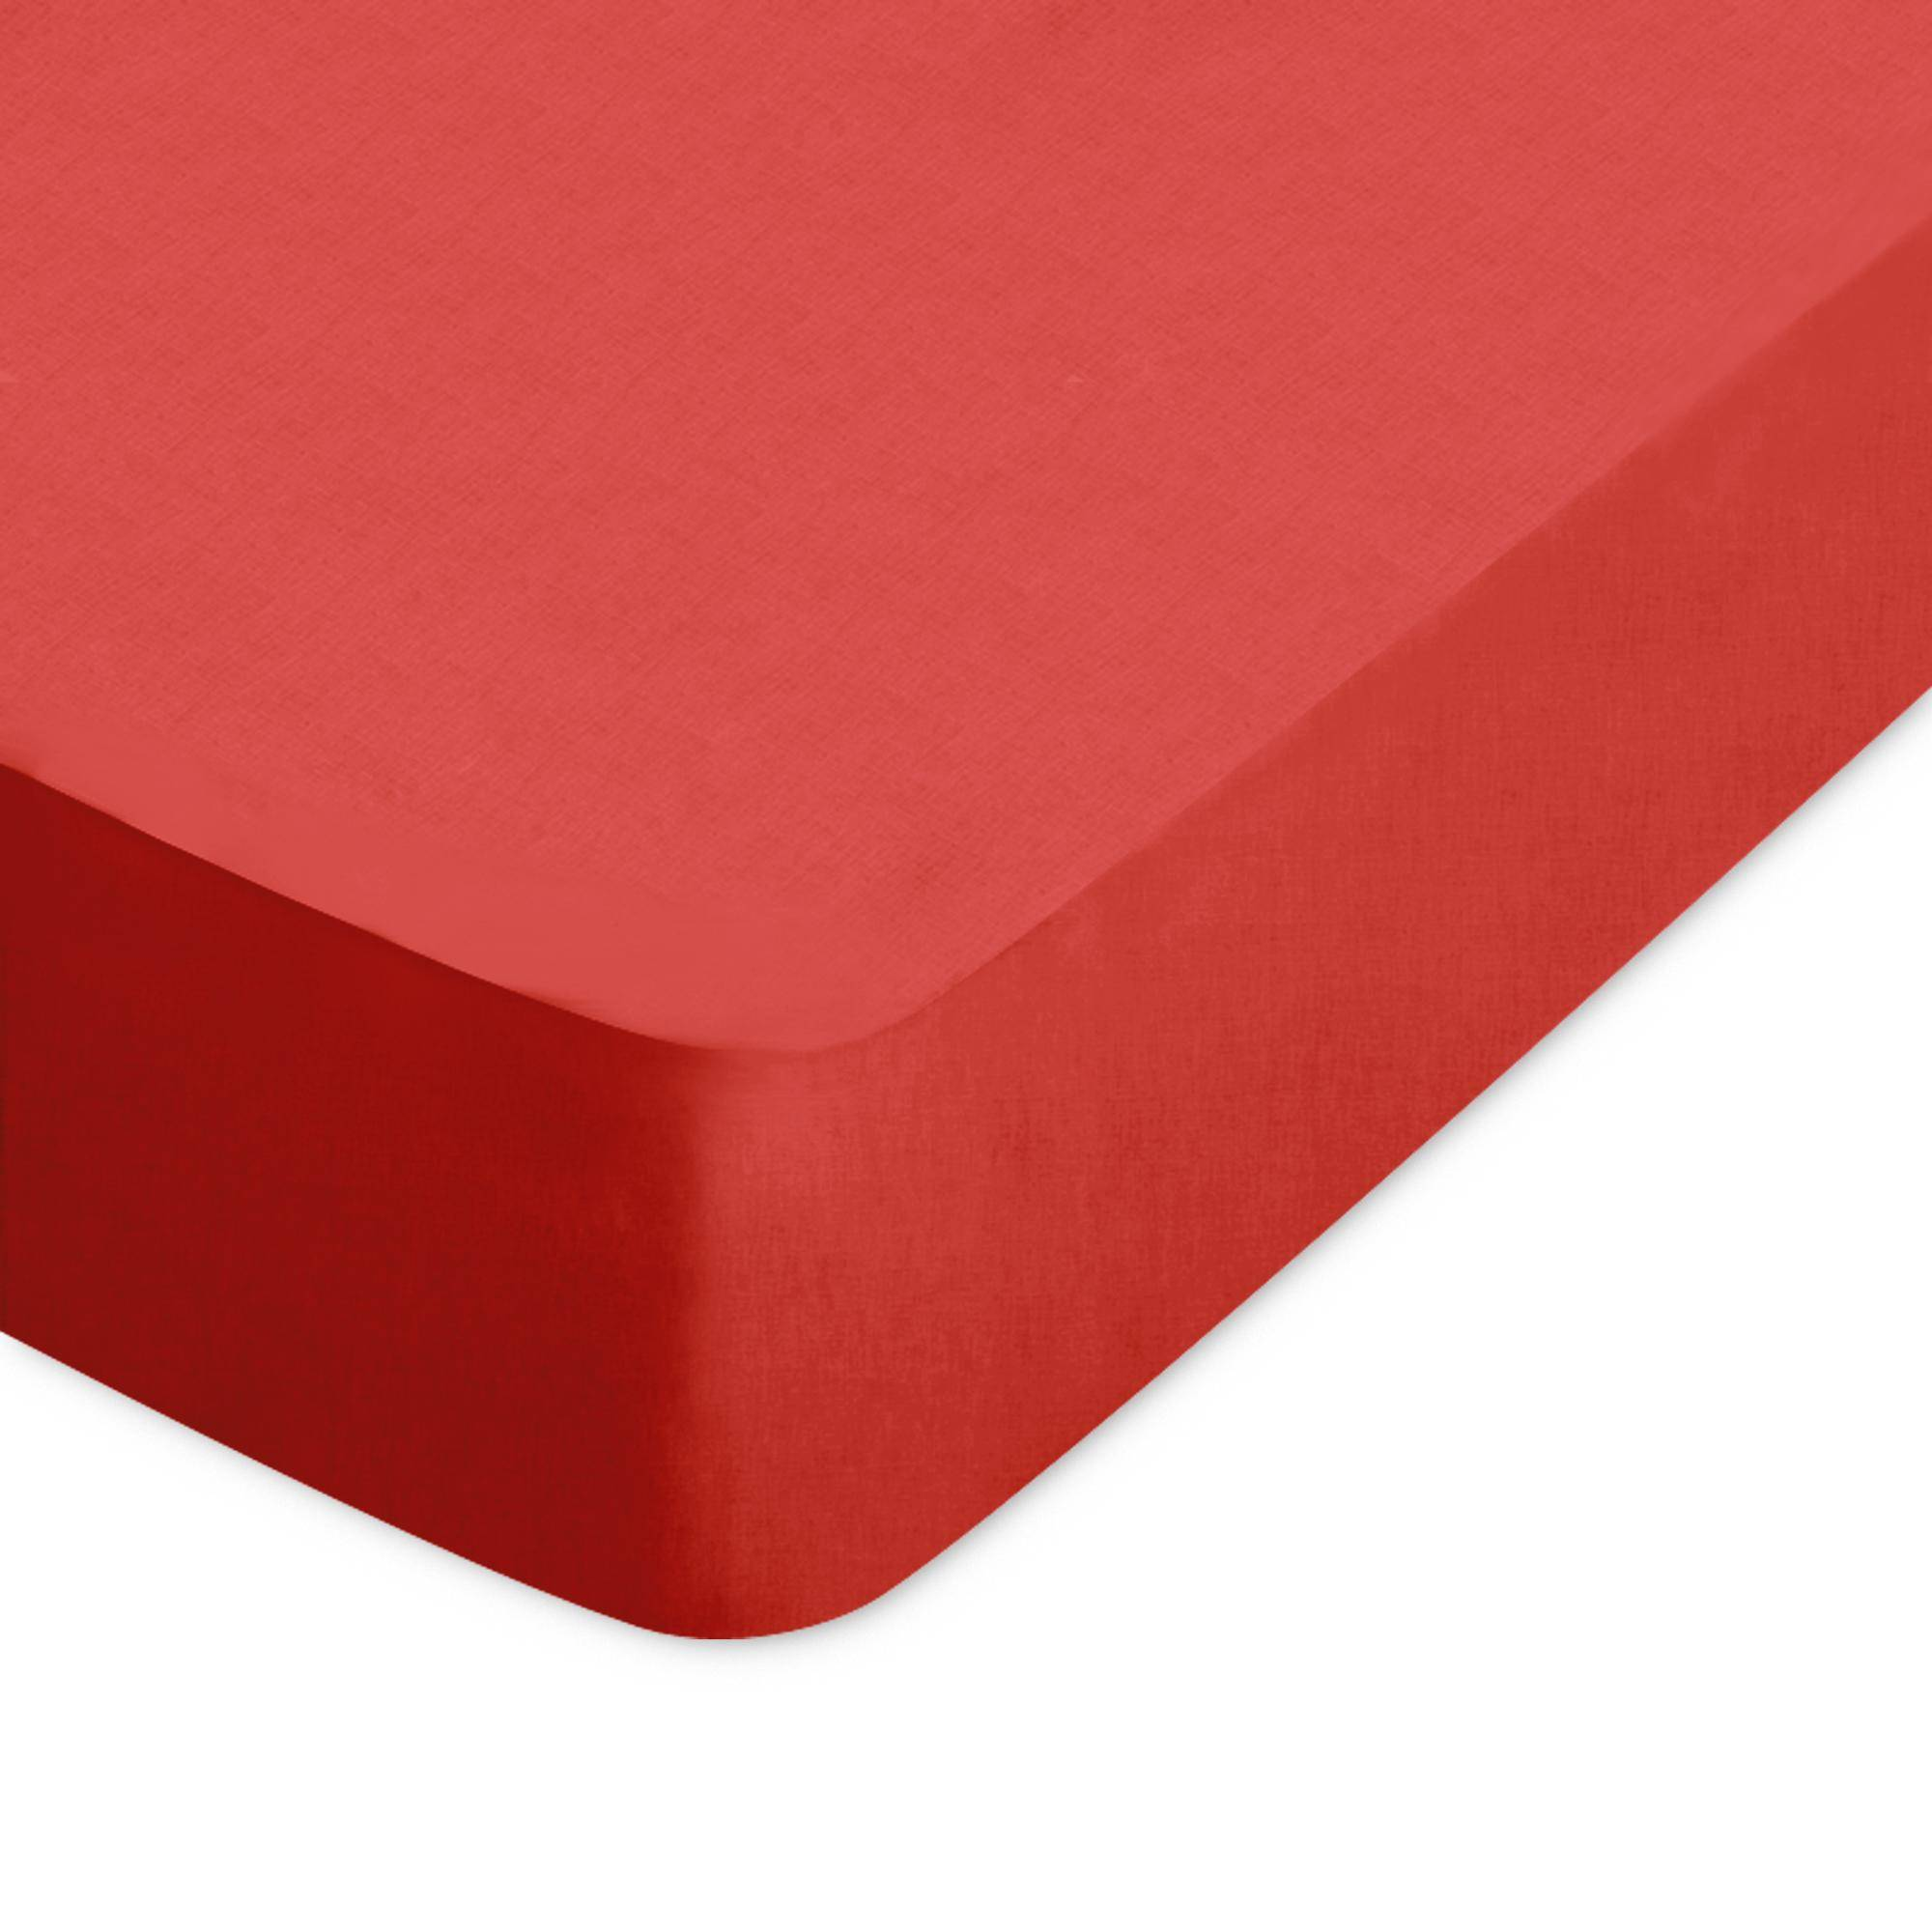 Linnea Drap housse uni 120x190 cm 100% coton ALTO orange Baie de Goji